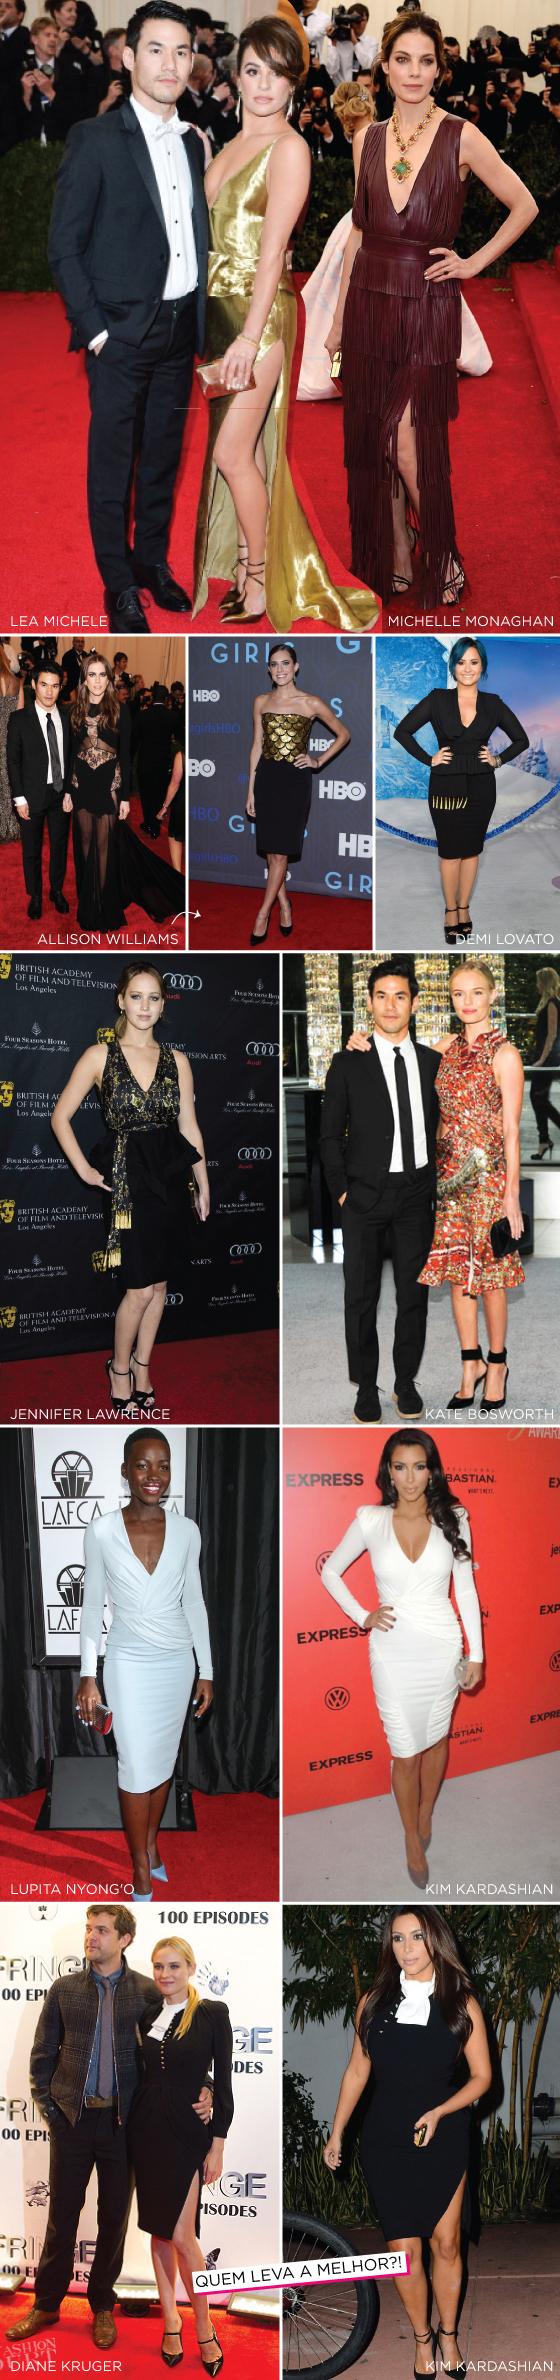 altuzarra-target-colecao-colaboration-colaboracao-data-preco-novidade-moda-fashion-celebridades-lea-michele0lupita-kim-kardashian-jennifer-lawrence-red-carpet